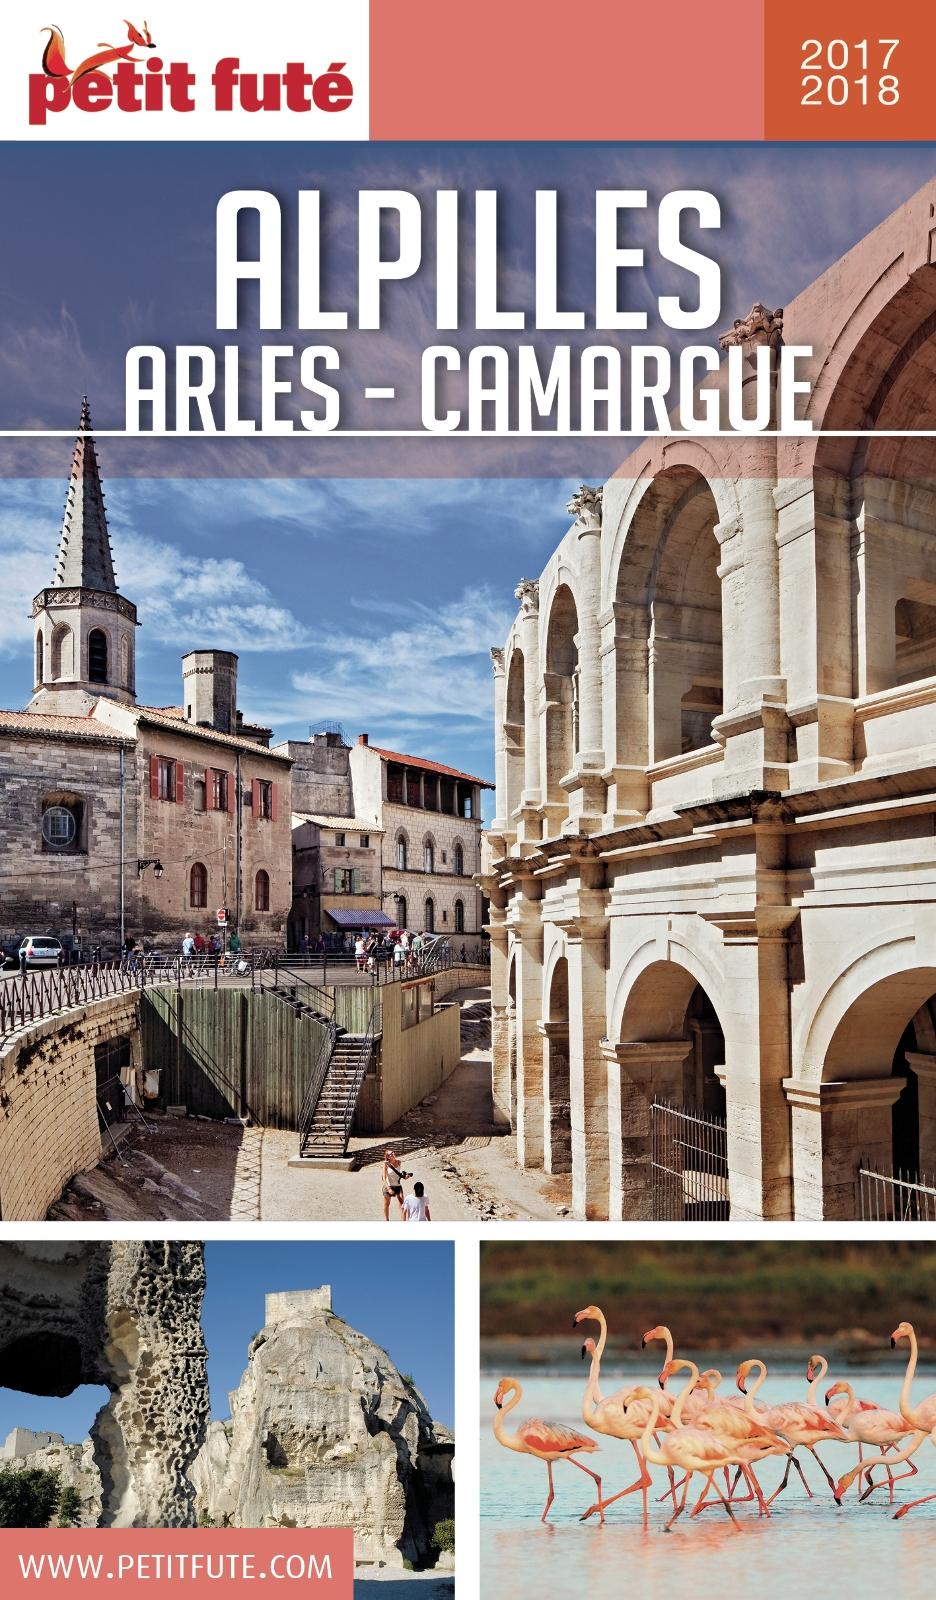 ALPILLES - CAMARGUE - ARLES...